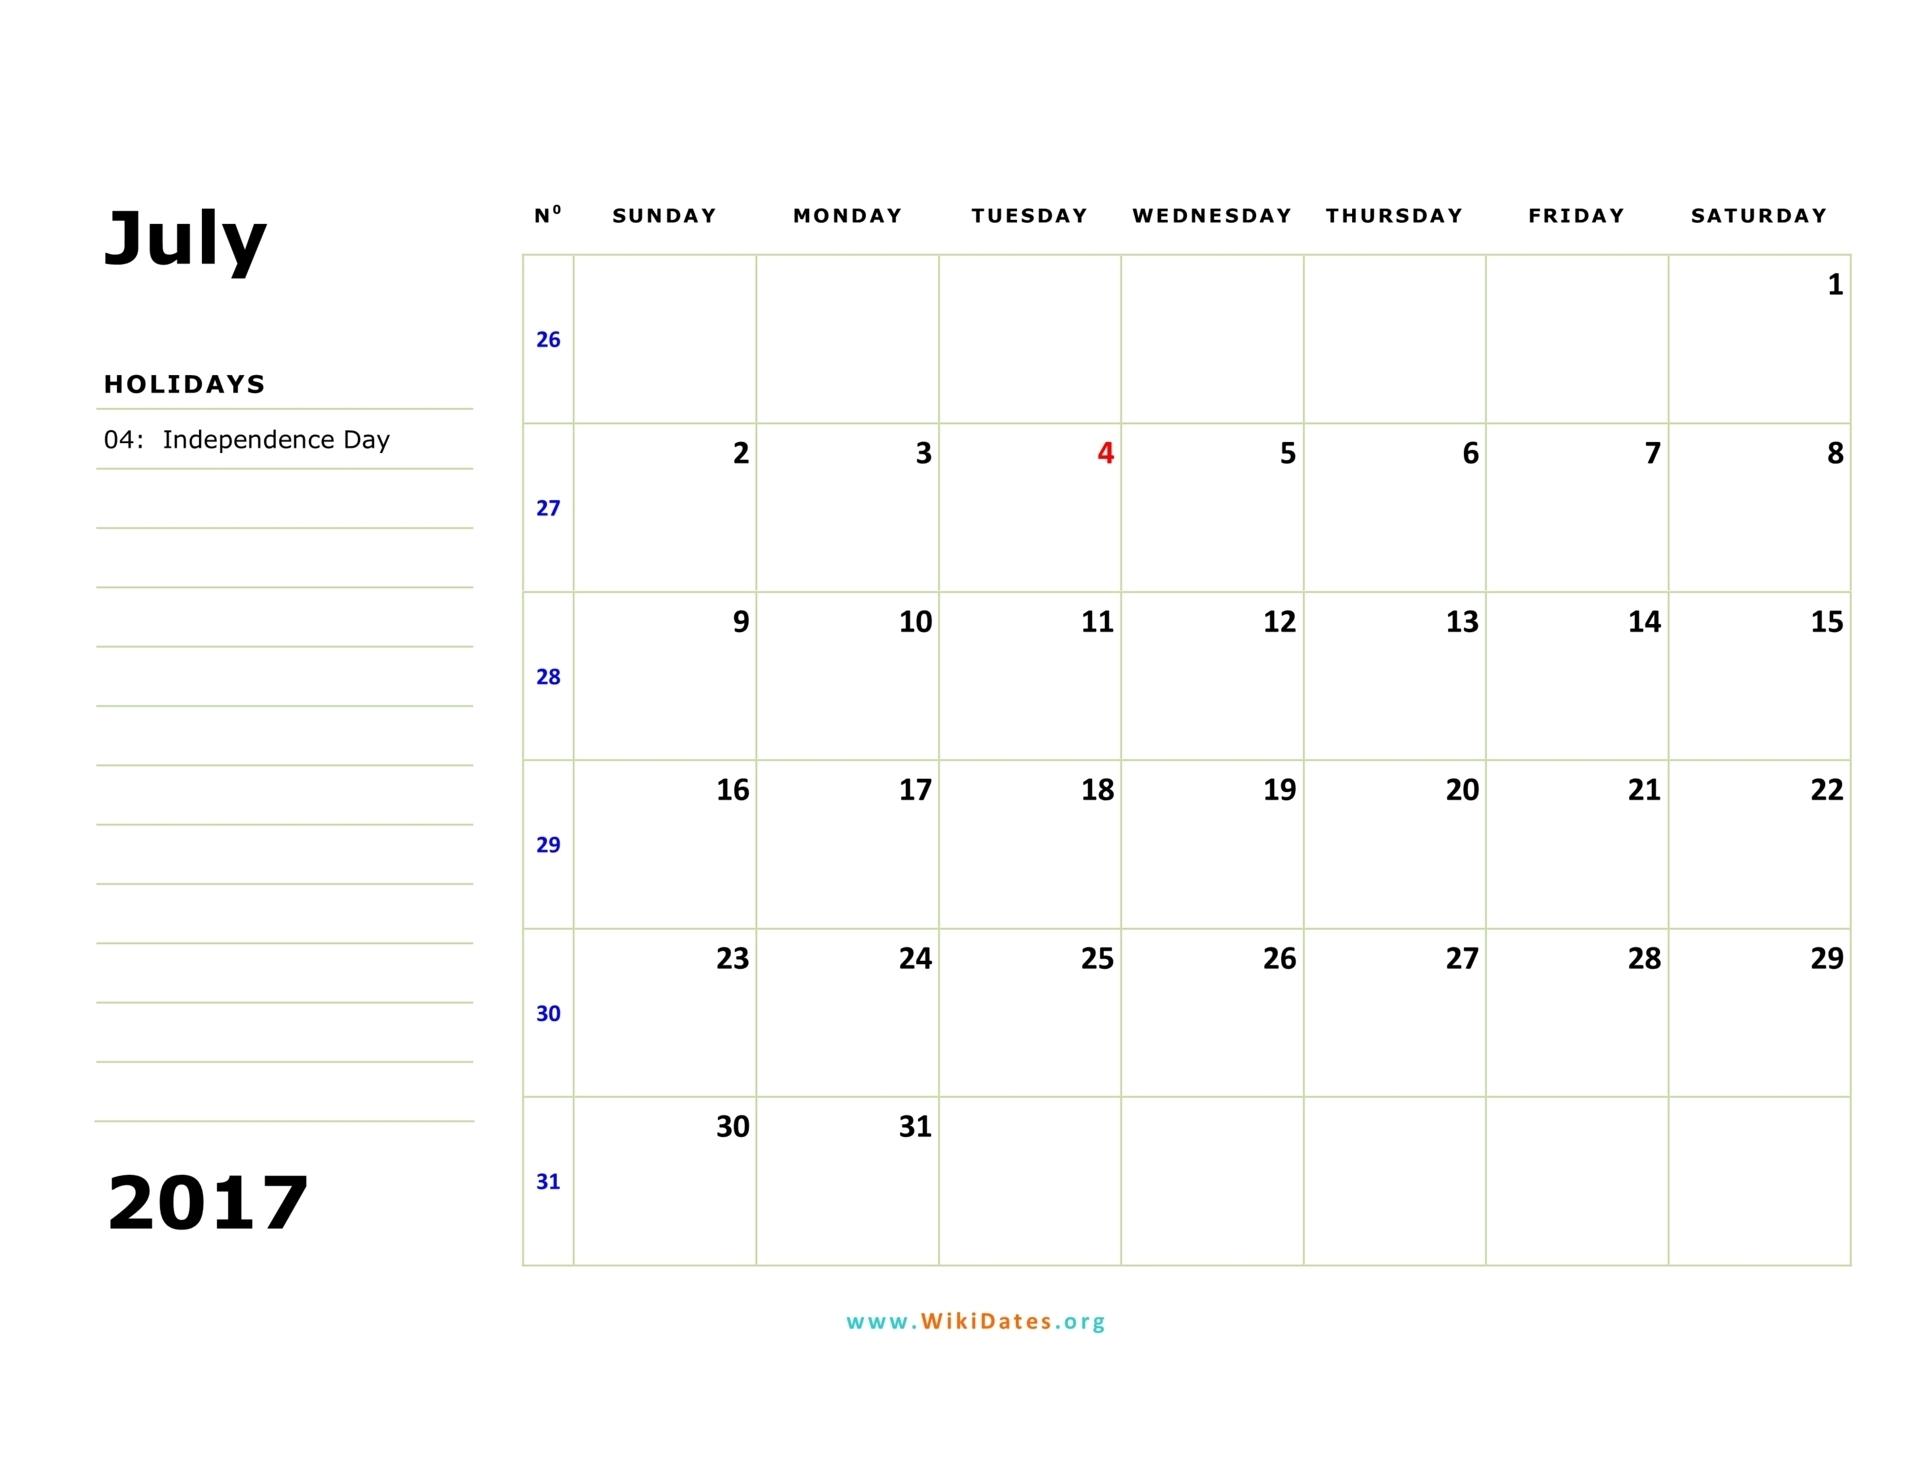 July 2017 Calendar Wikidates